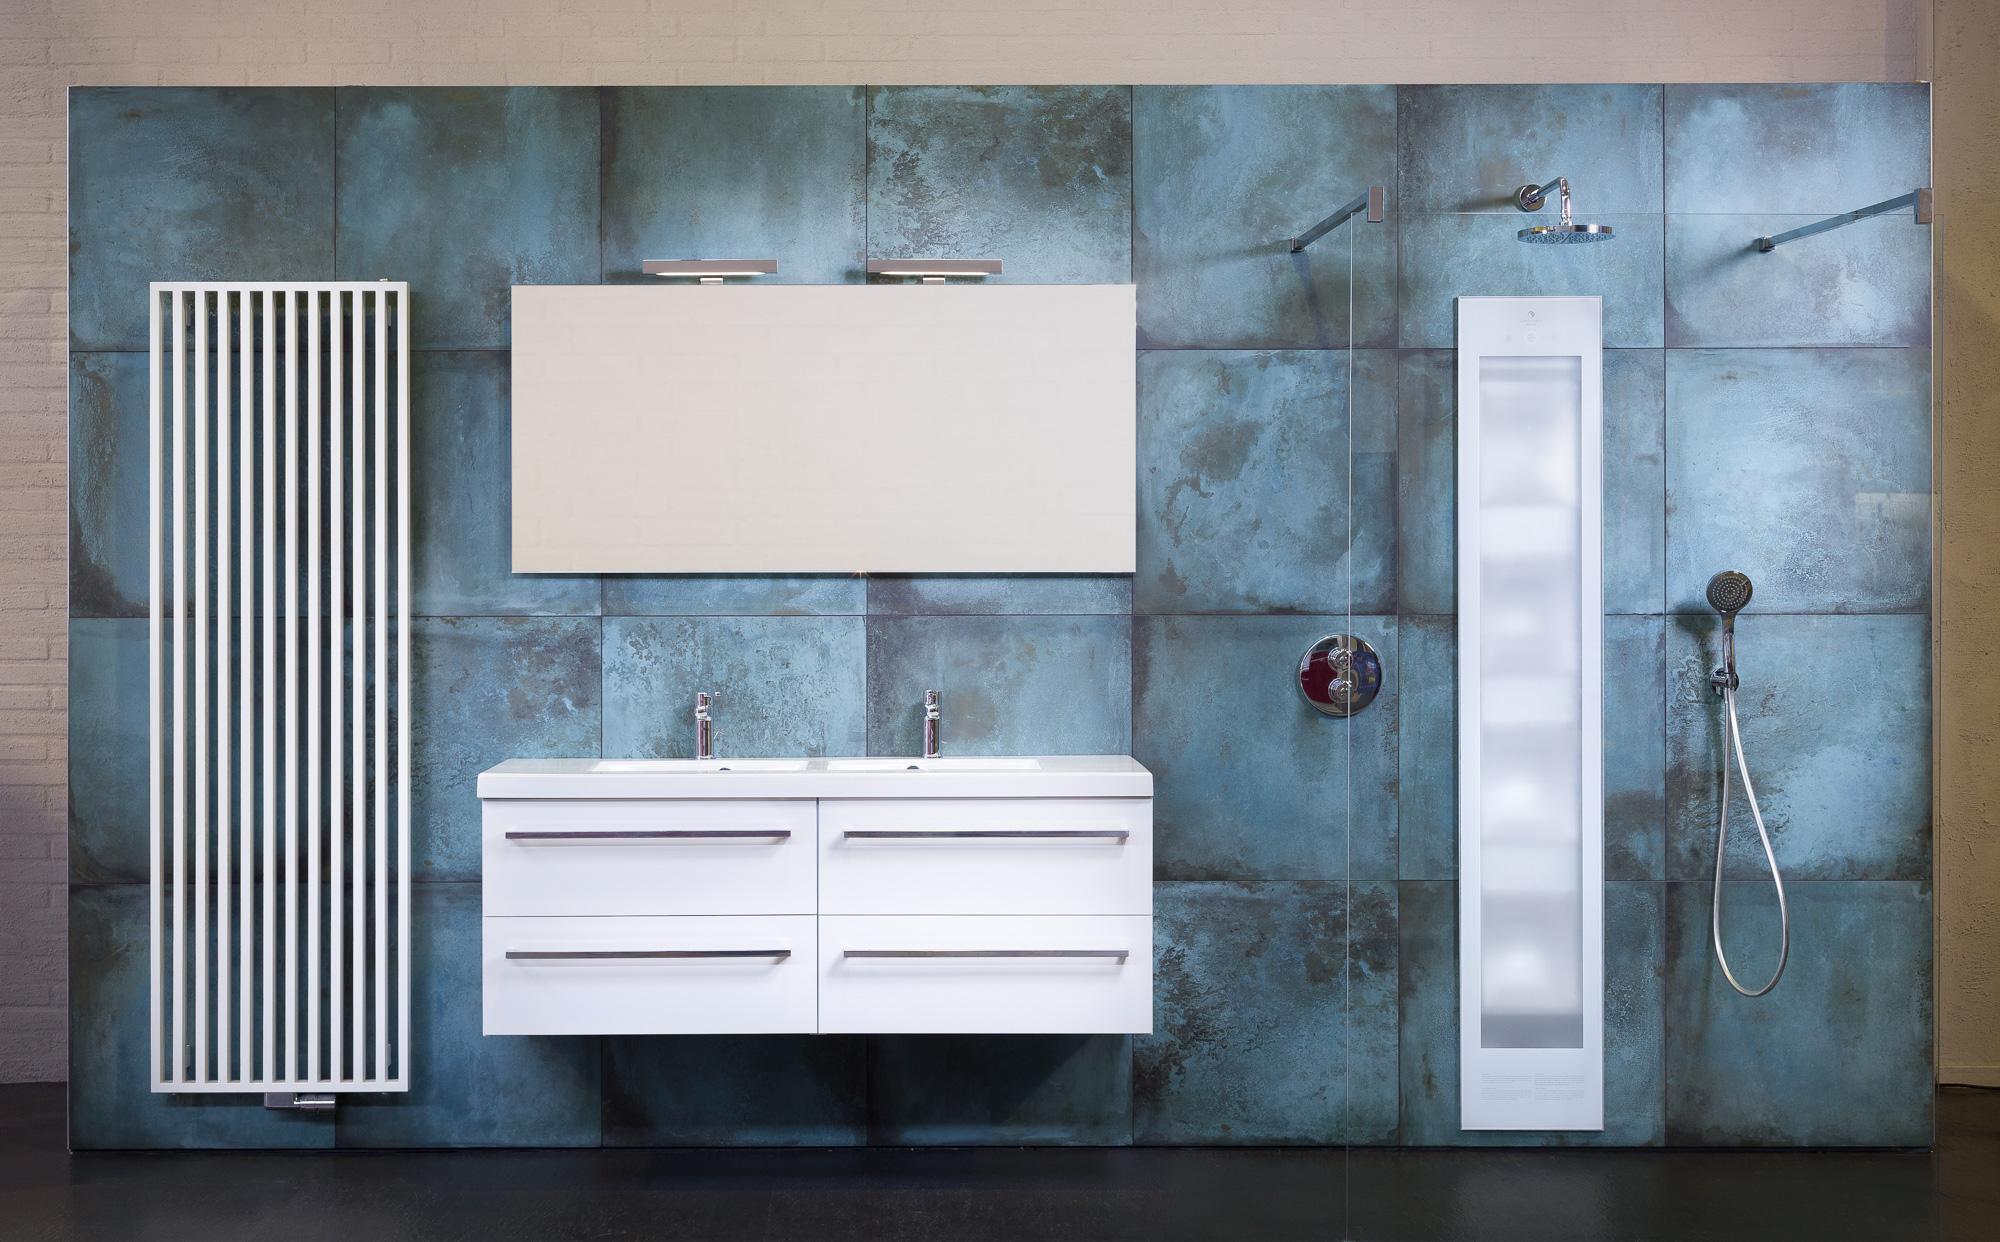 Badkamers Groningen Osloweg : Concordia keuken bad badkamers stijlvolle badkamer